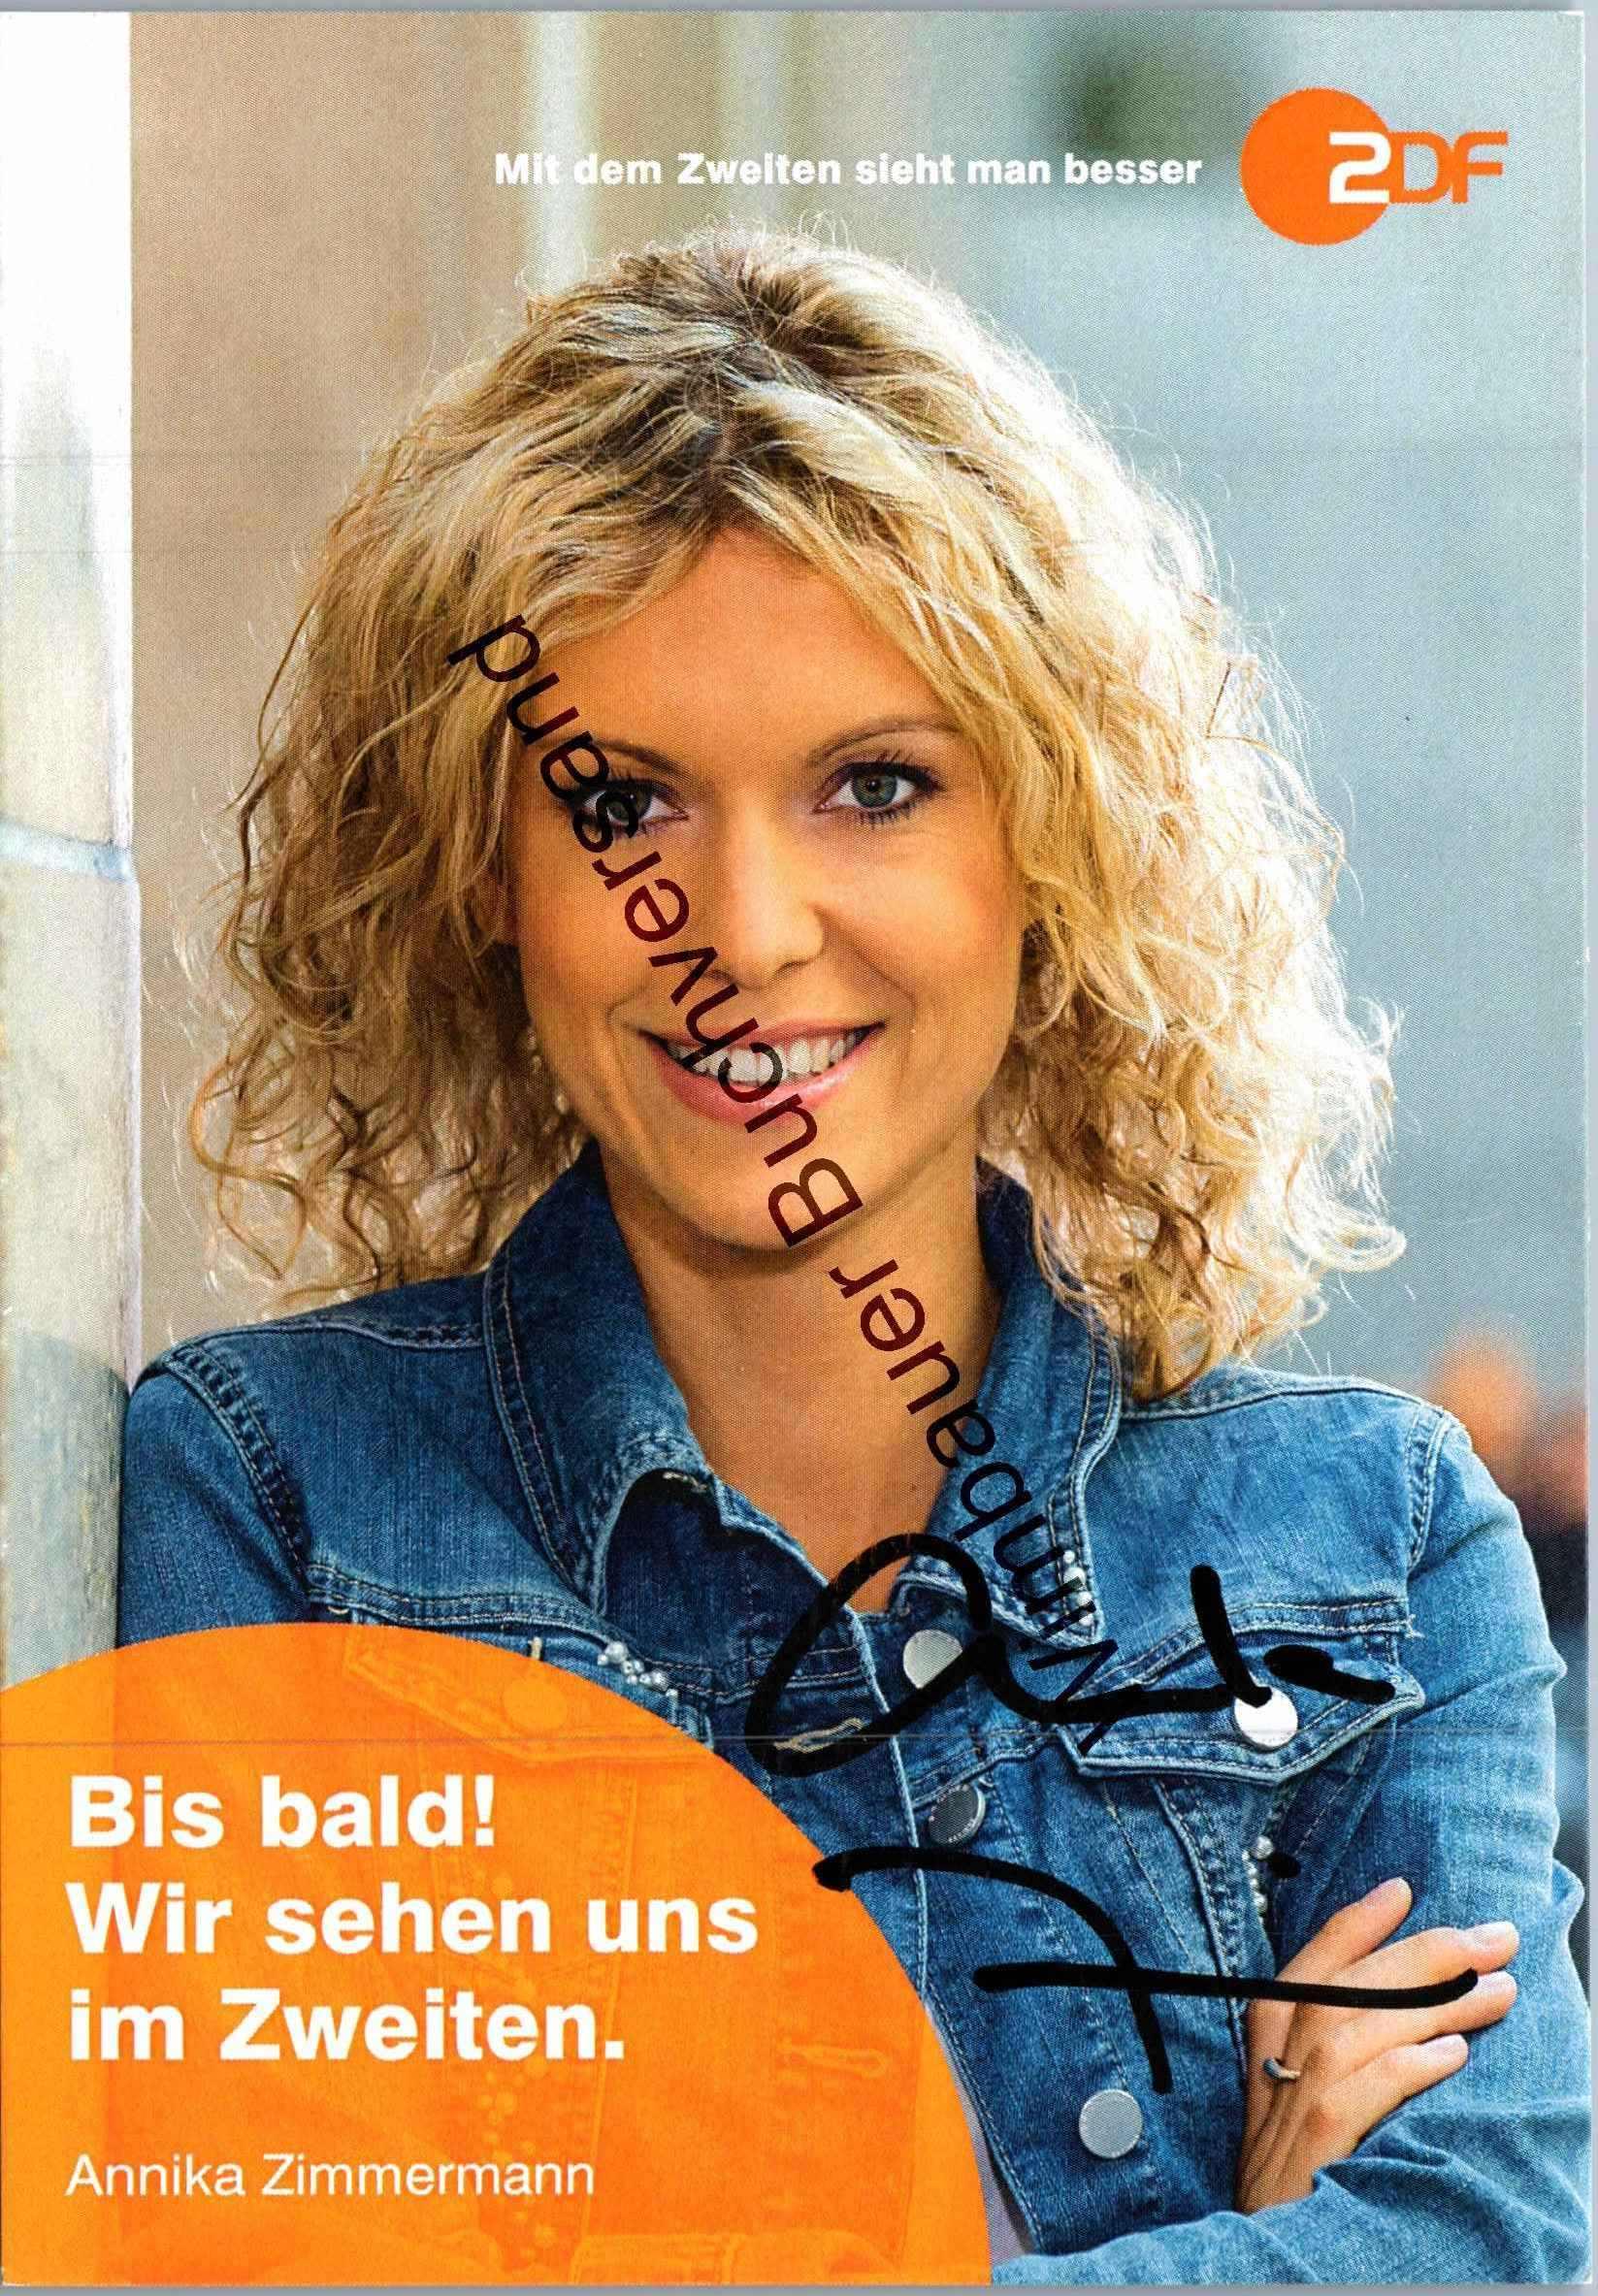 Original Autogramm Annika Zimmermann ZDF /// Autogramm Autograph signiert signed signee